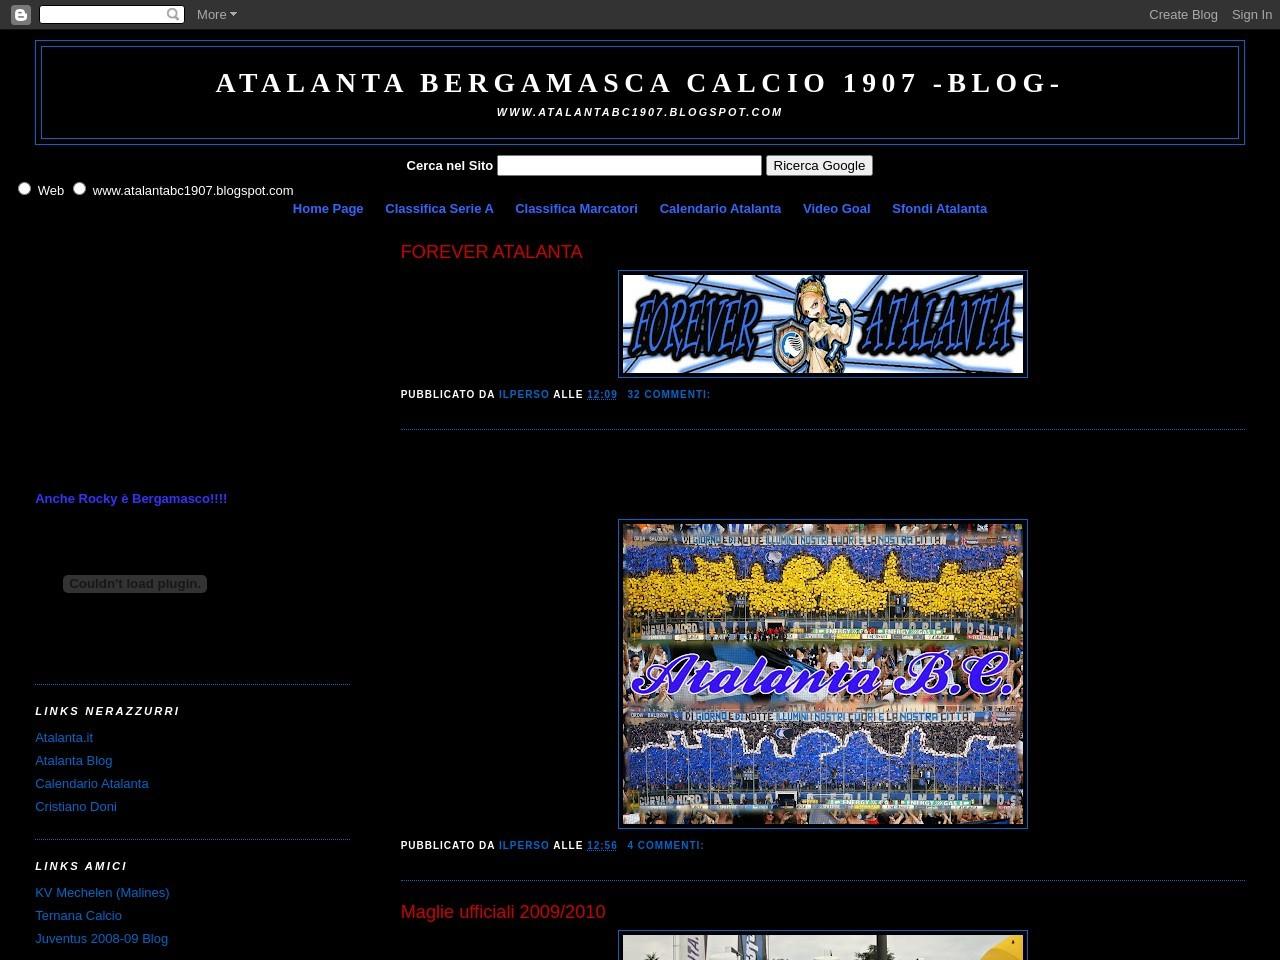 atalanta-bergamasca-calcio-blog